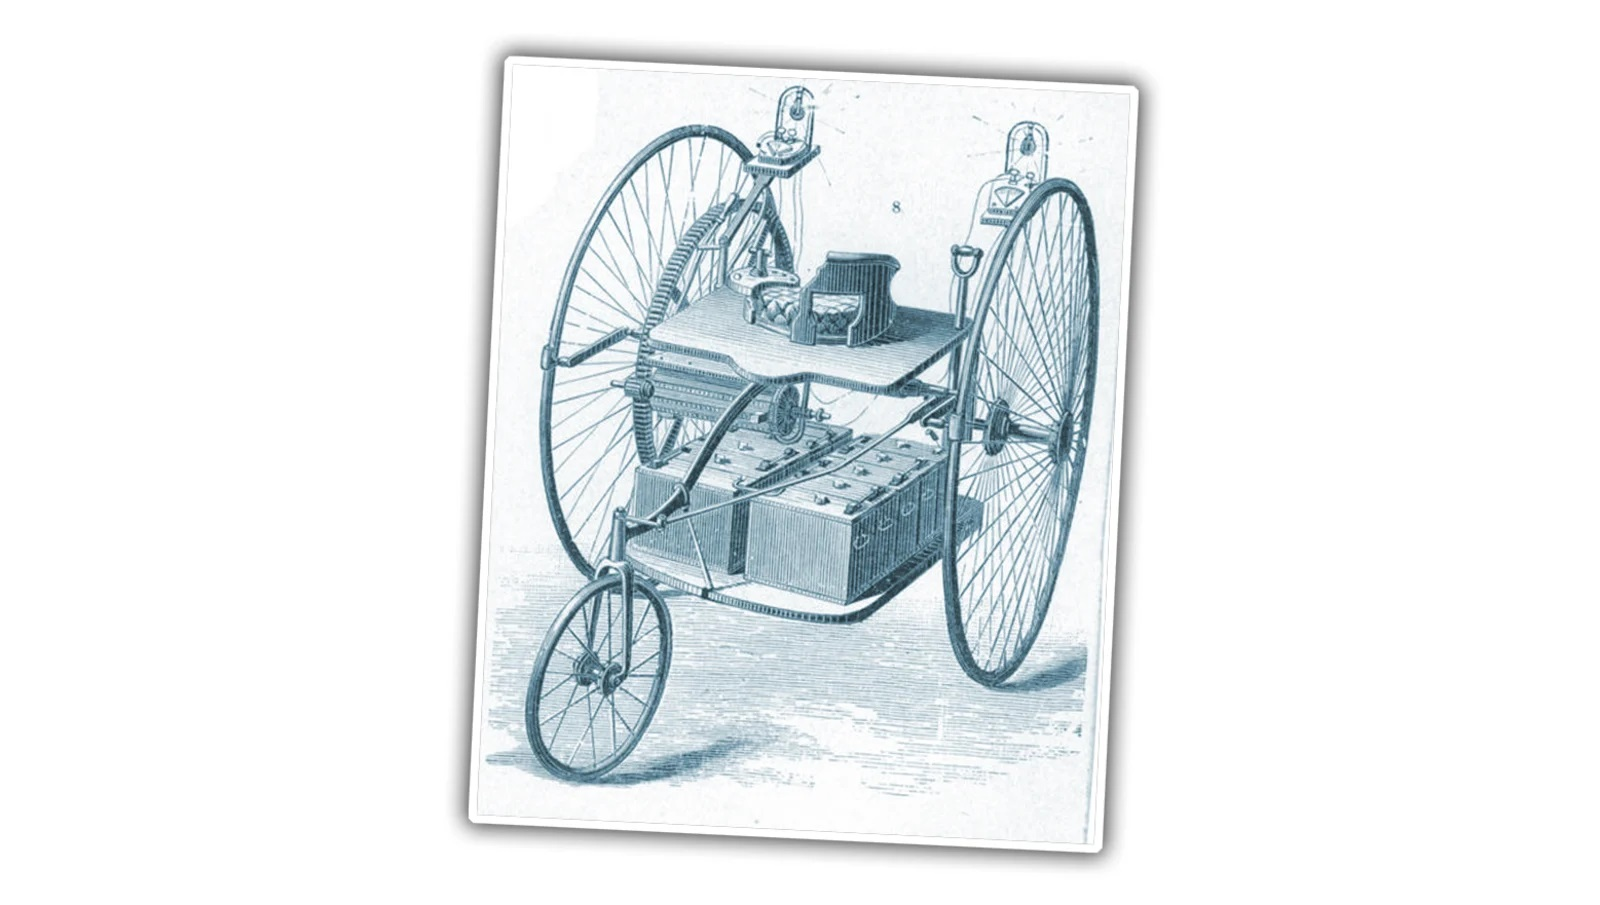 1832 Robert Anderson's Electric Car